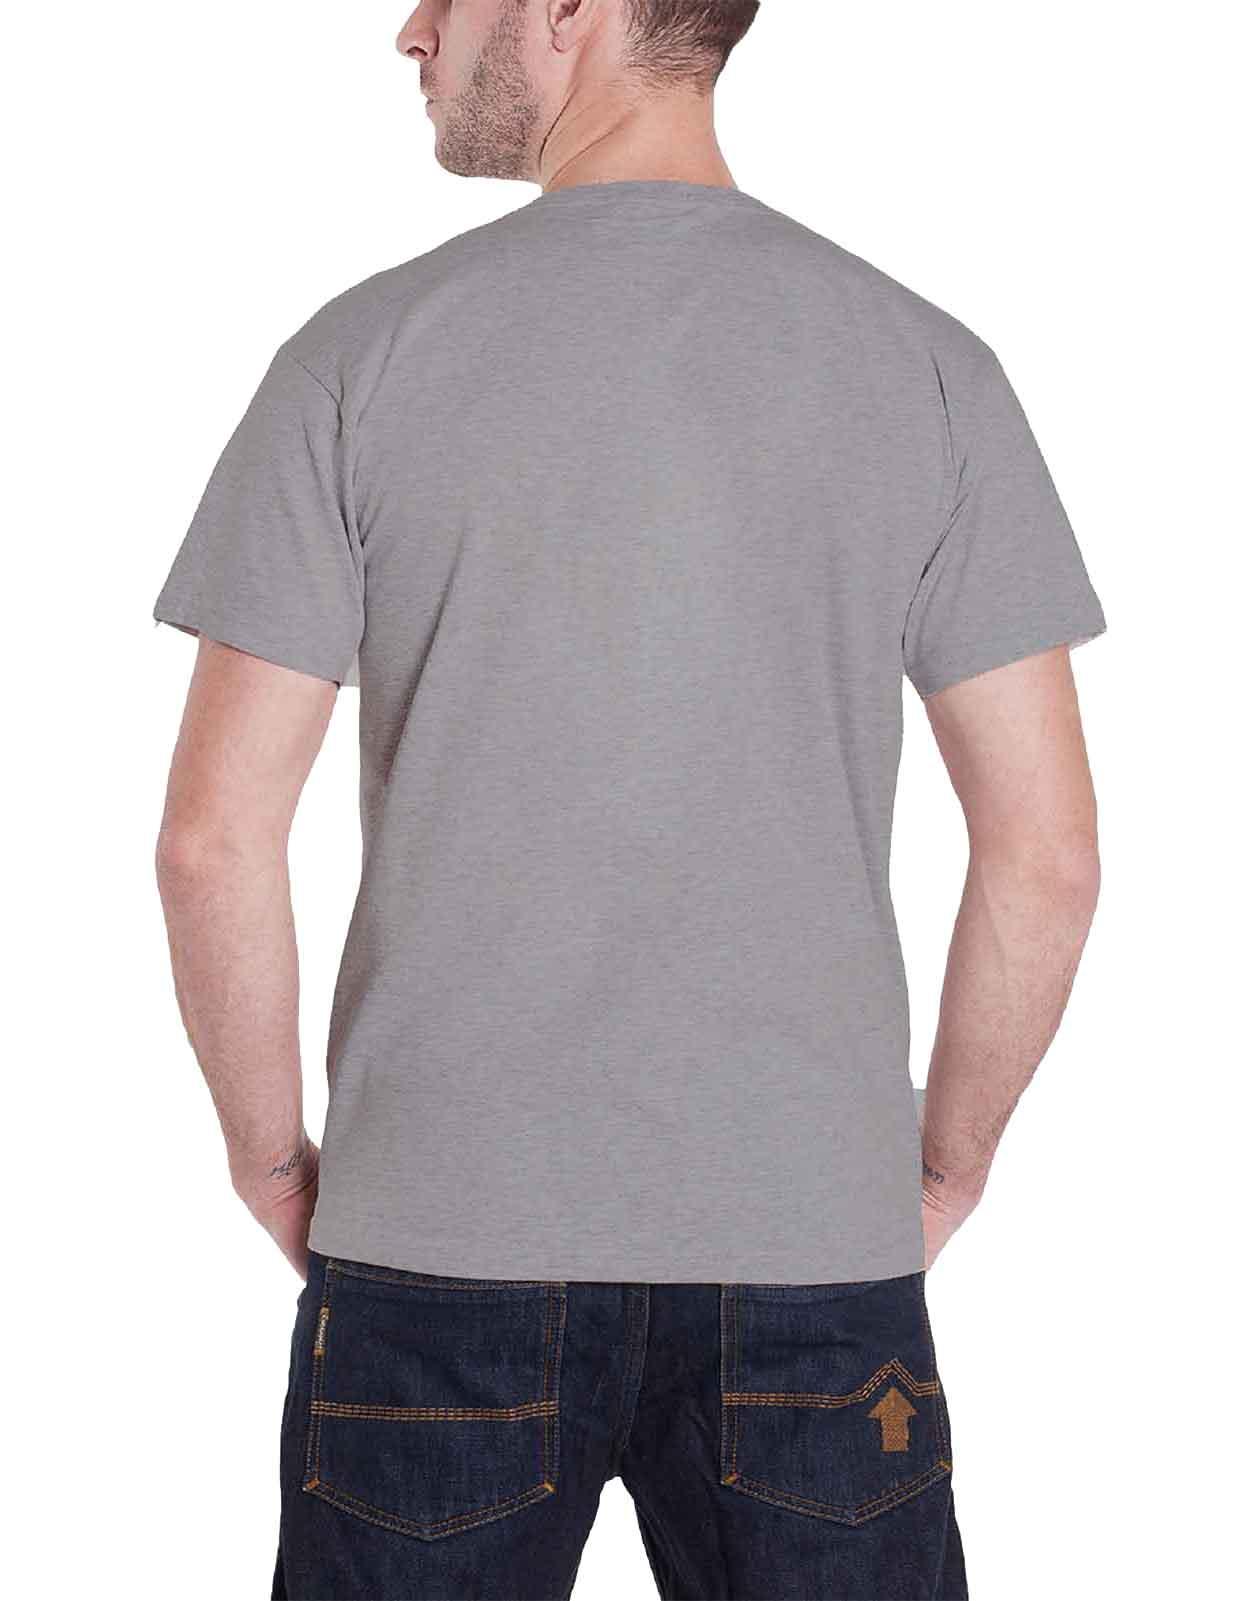 Officiel-Harry-Potter-T-Shirt-Poudlard-Gryffondor-Poufsouffle-cretes-Homme-NEUF miniature 55